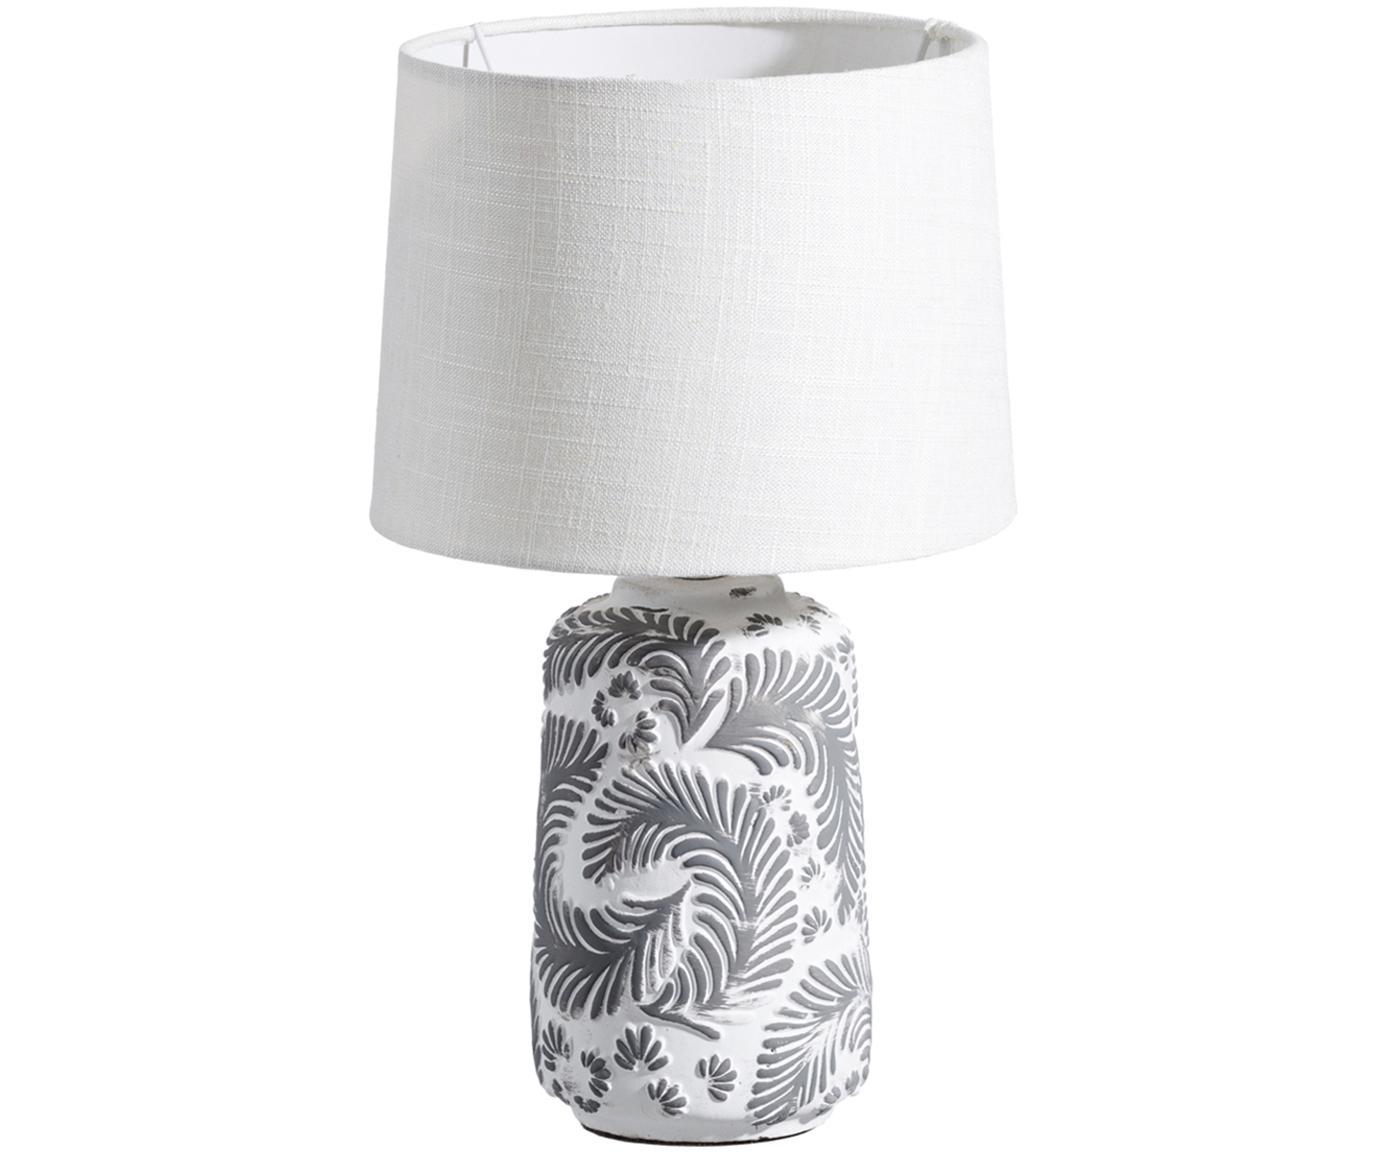 Tafellamp Folk, Keramiek, Wit, grijs, Ø 23 x H 38 cm